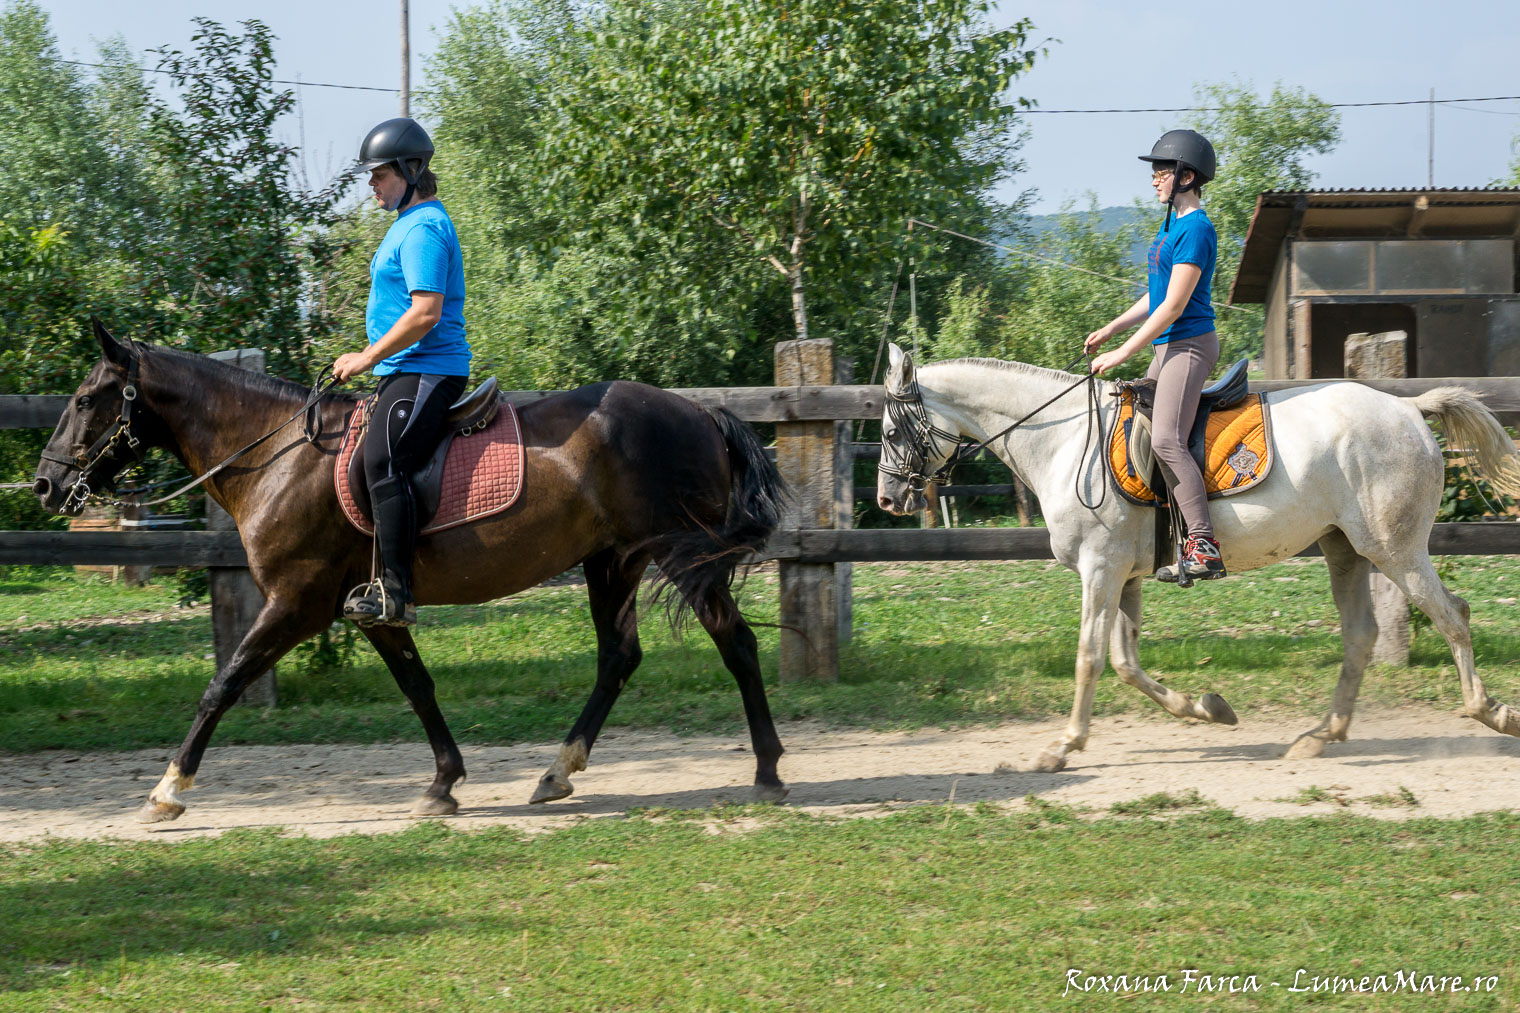 caii-lupilor-7422